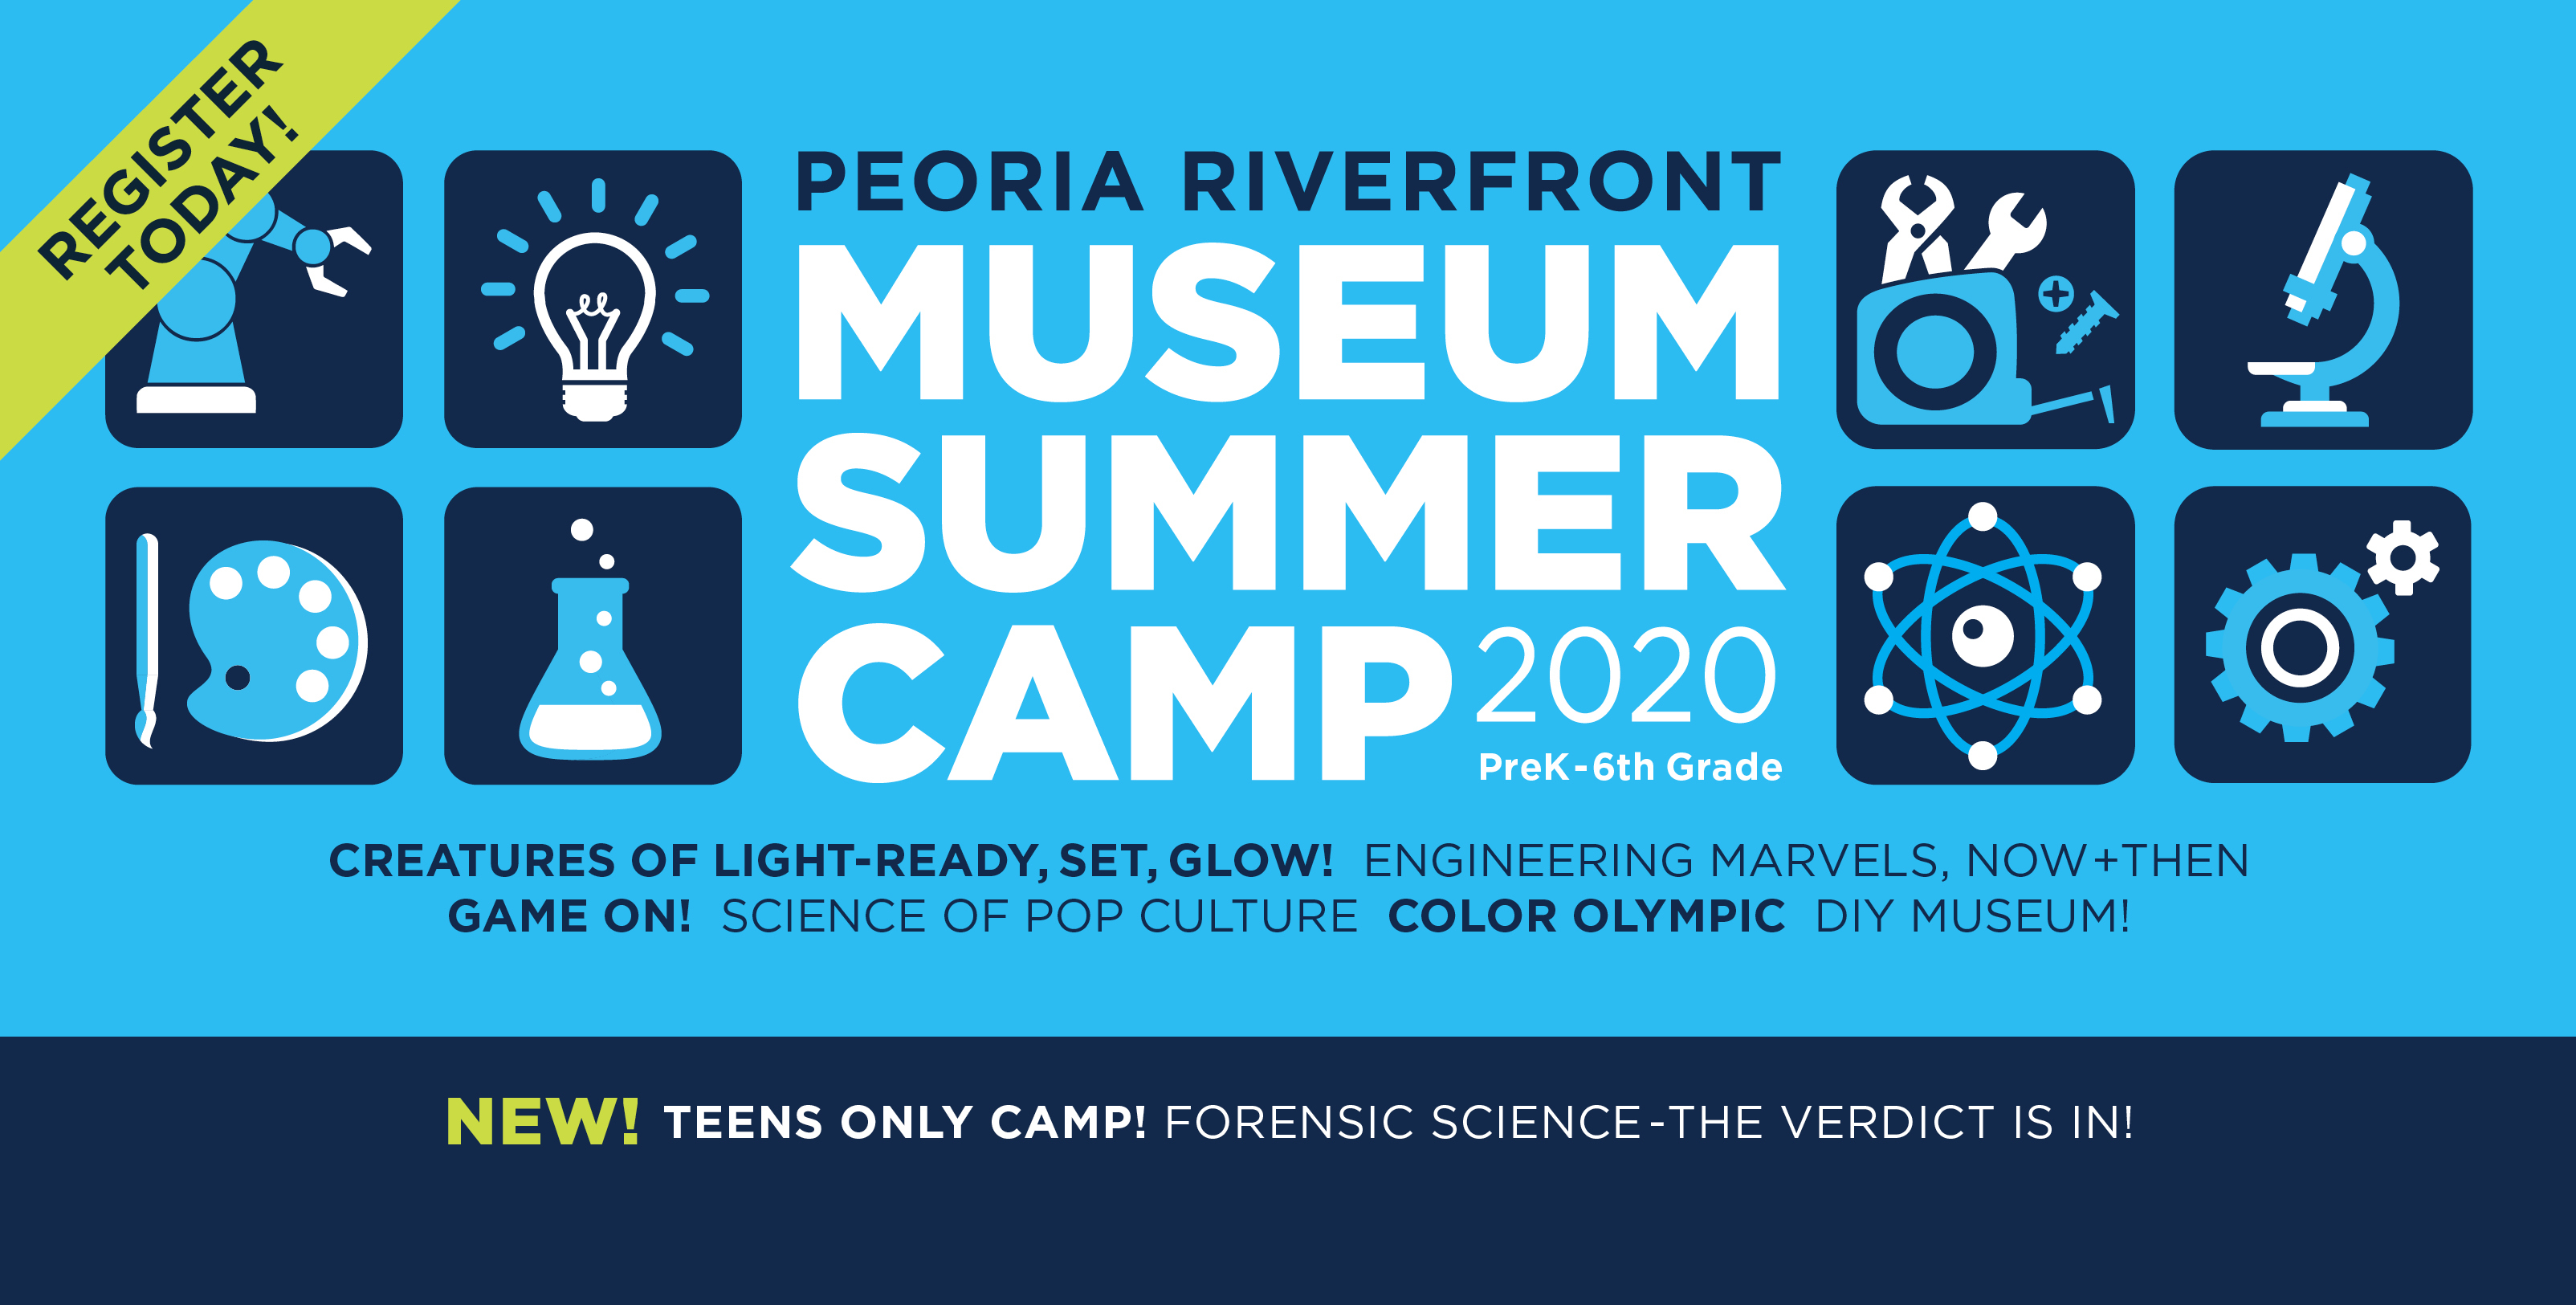 Events - Peoria Riverfront Museum pertaining to Calendar Events Peoria Il